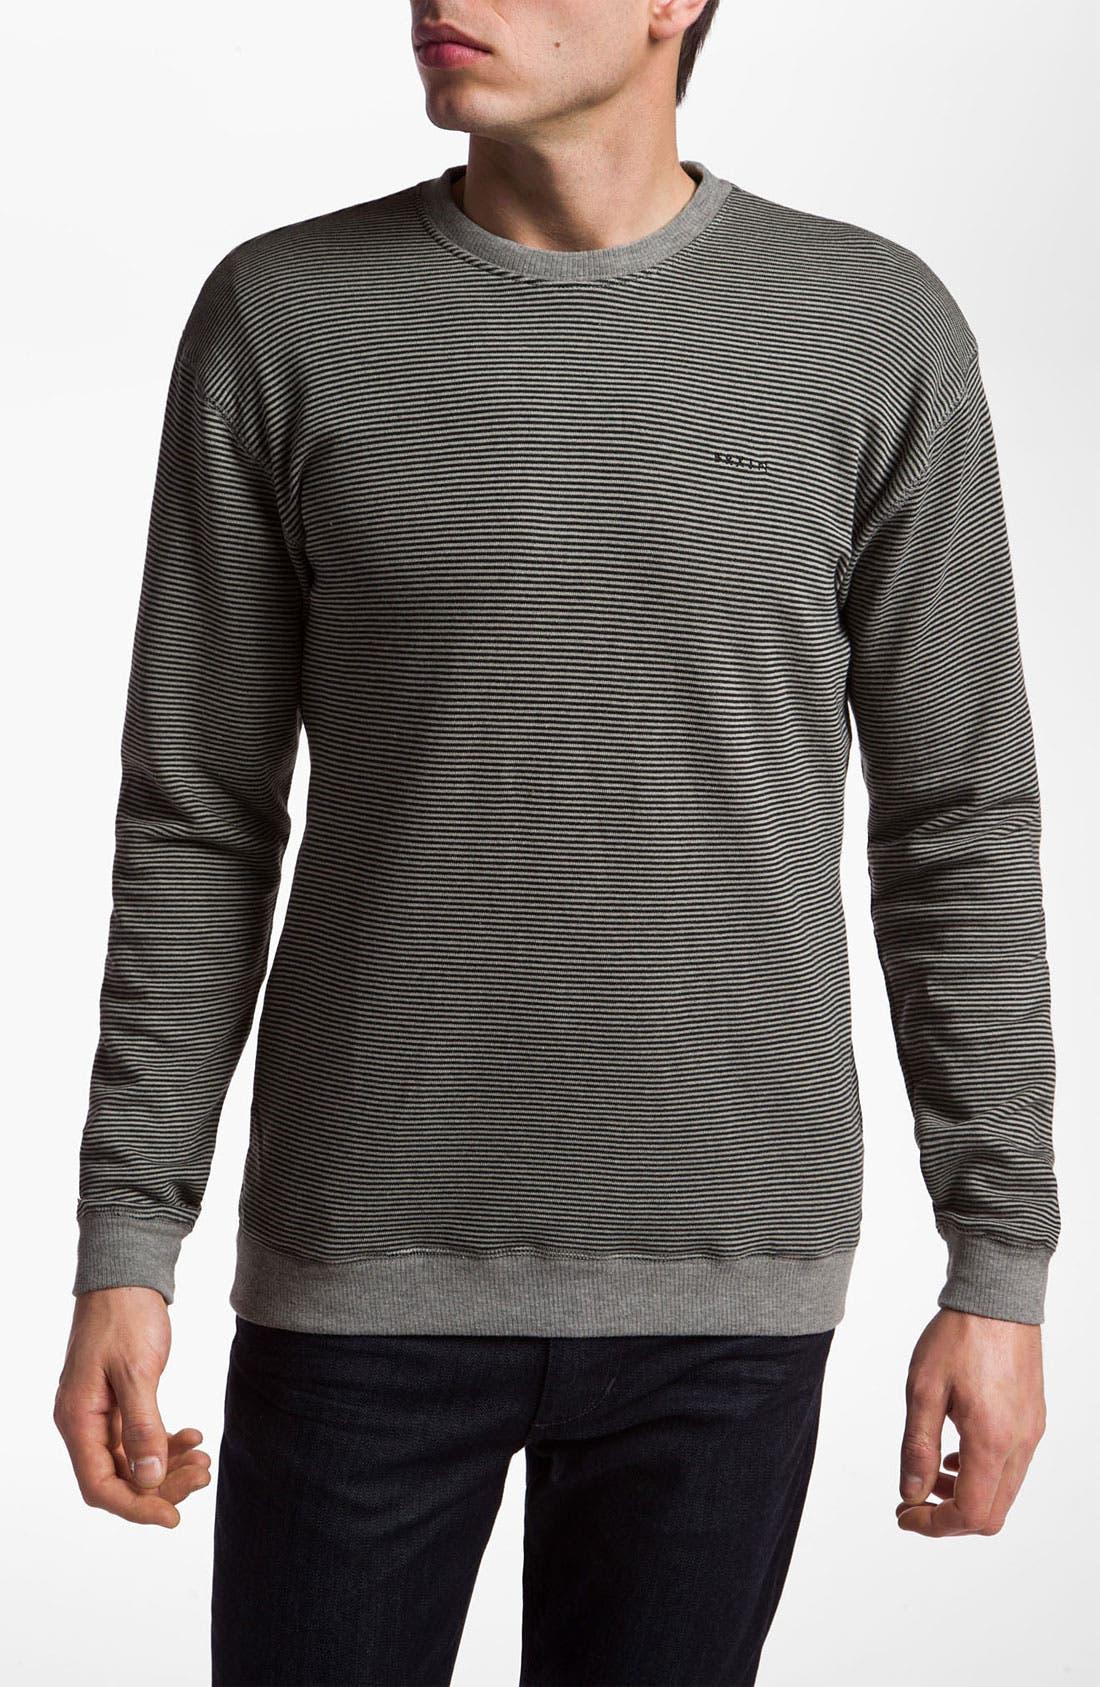 Main Image - Brixton 'Partisan' Crewneck Sweatshirt